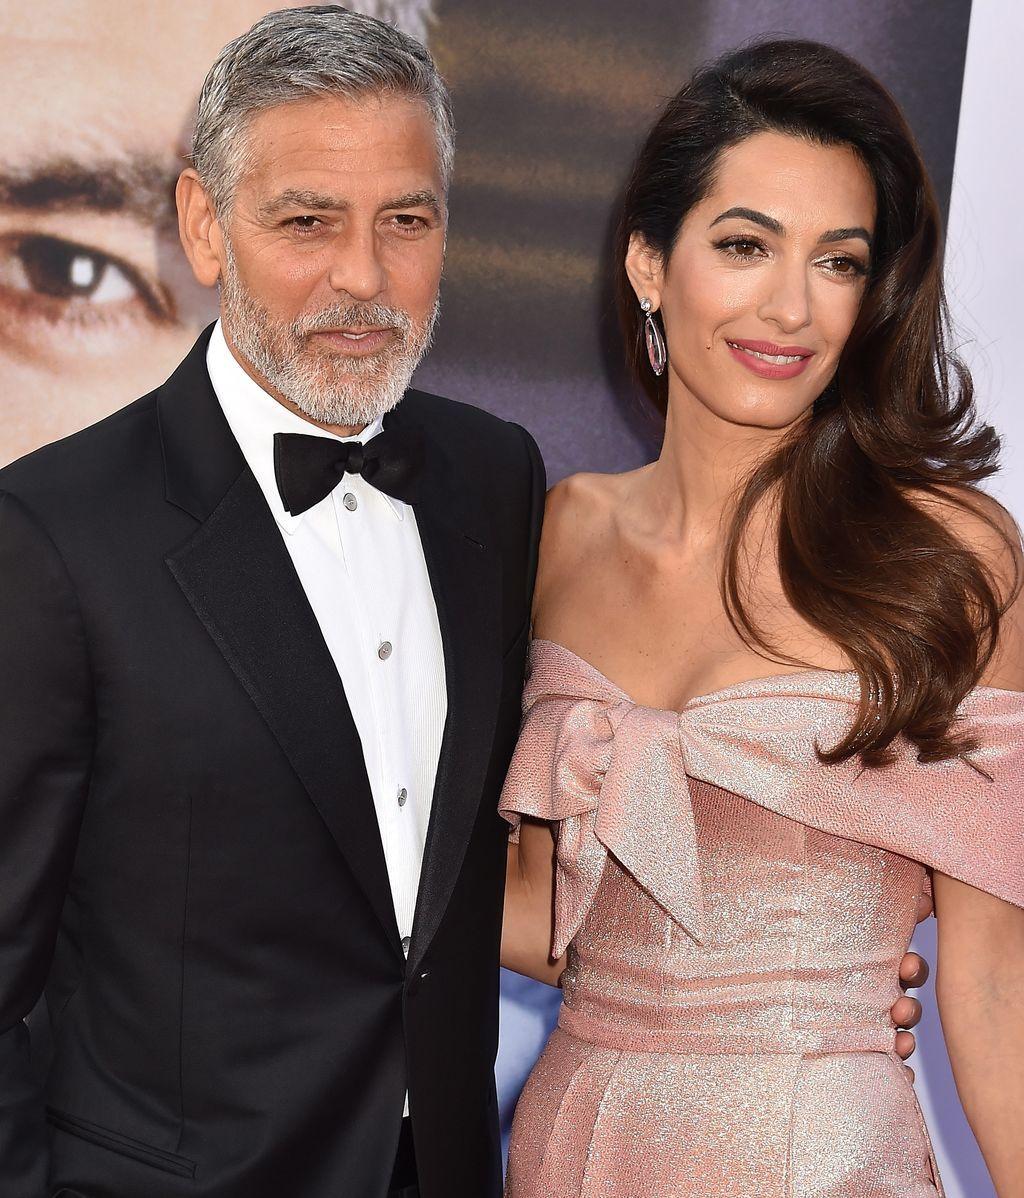 Las 7 frases de amor de Amal a Clooney que parecen de película